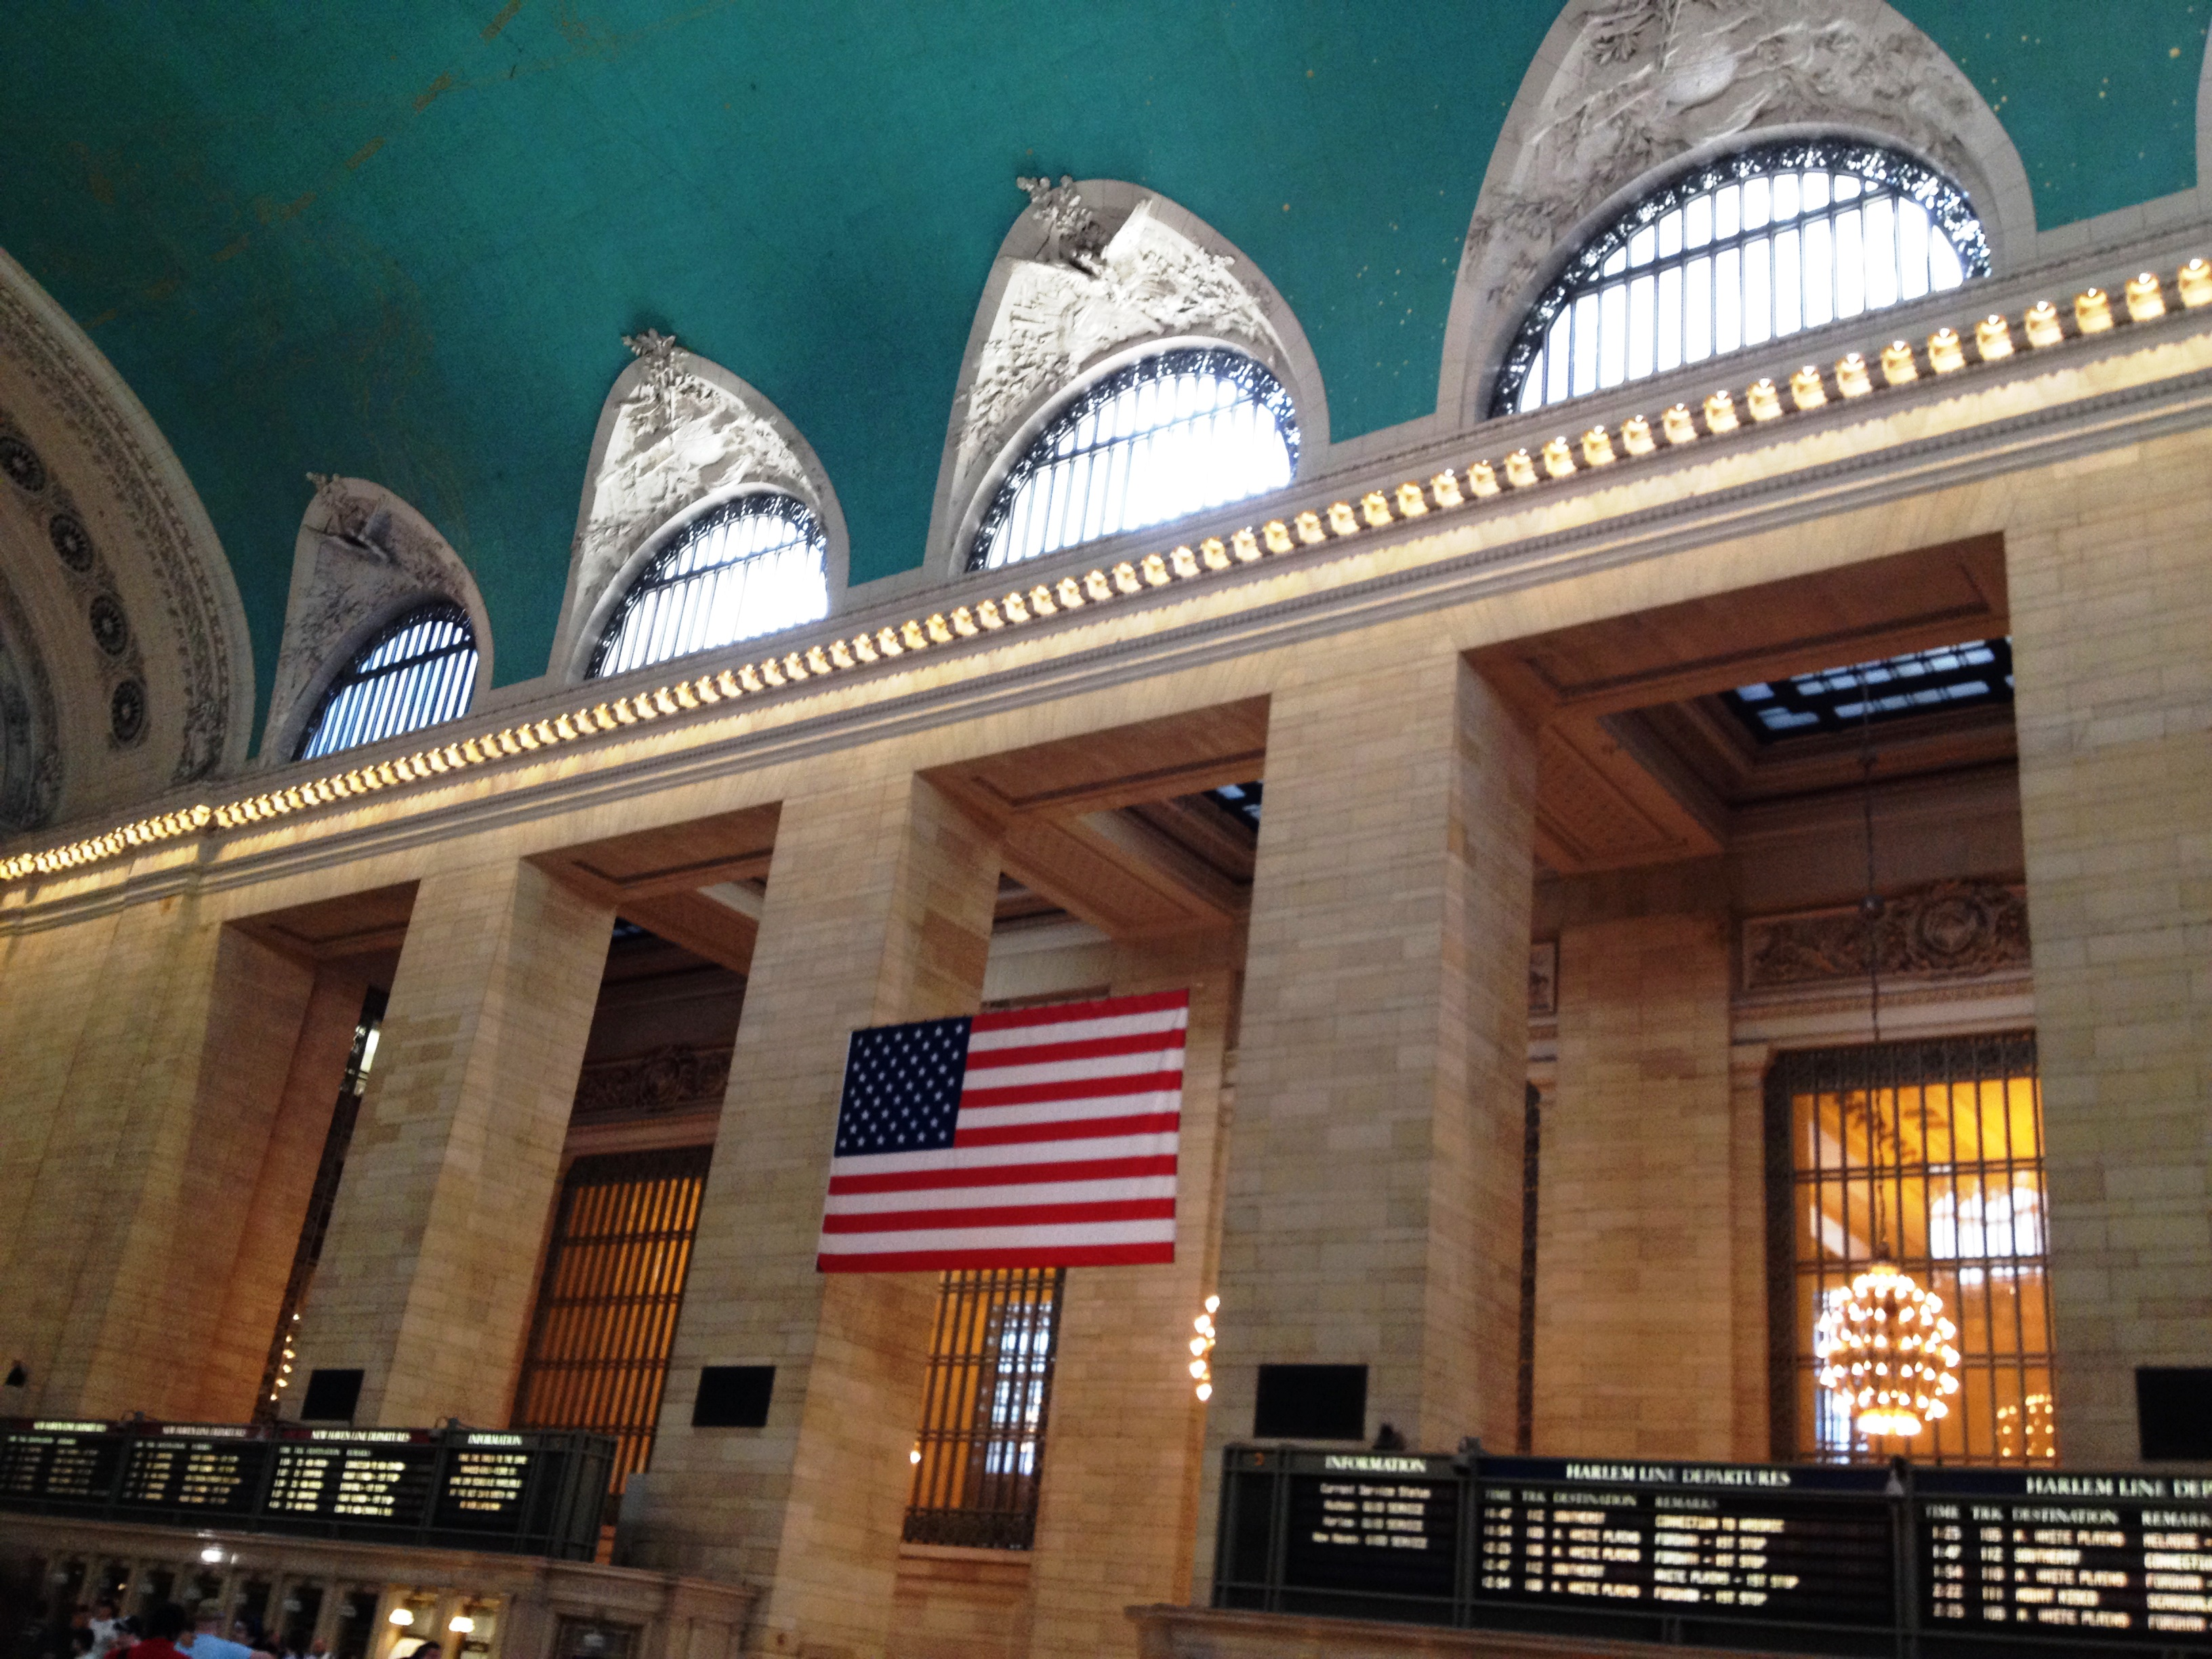 new-york-grand-central-station-manhattan-travelgrip- (2)